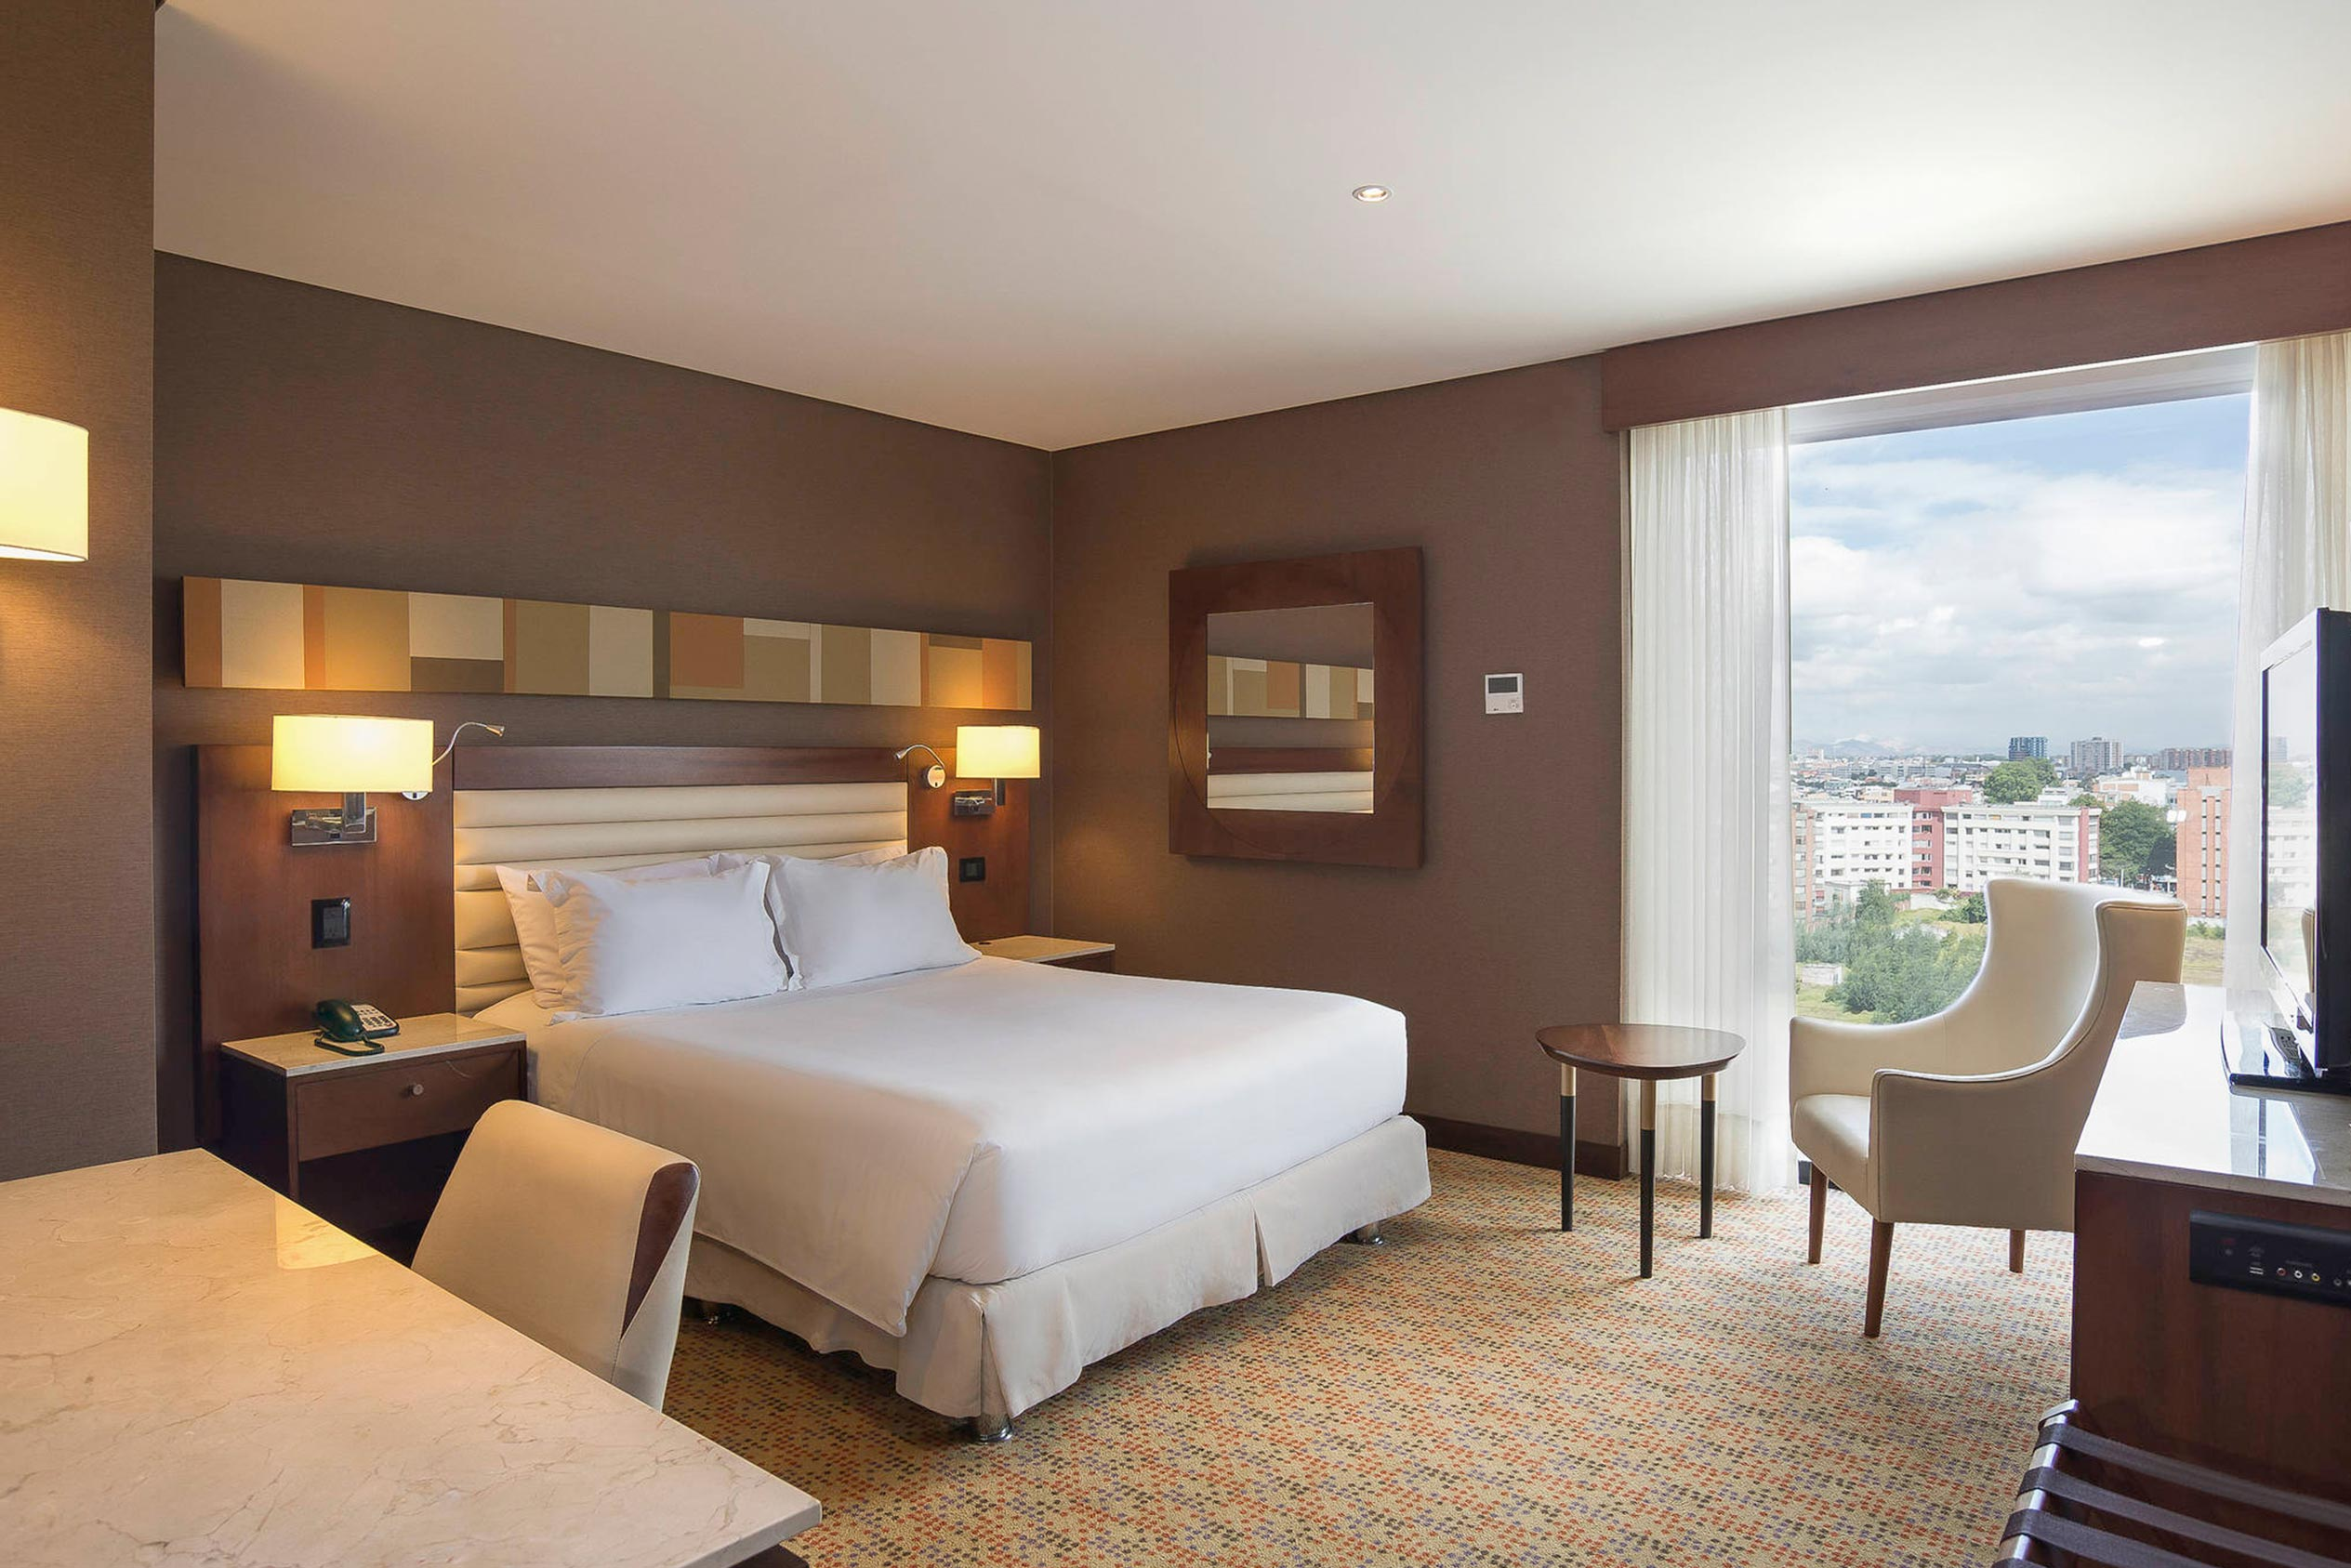 Pieza Hotel Mercure Bogotá 100